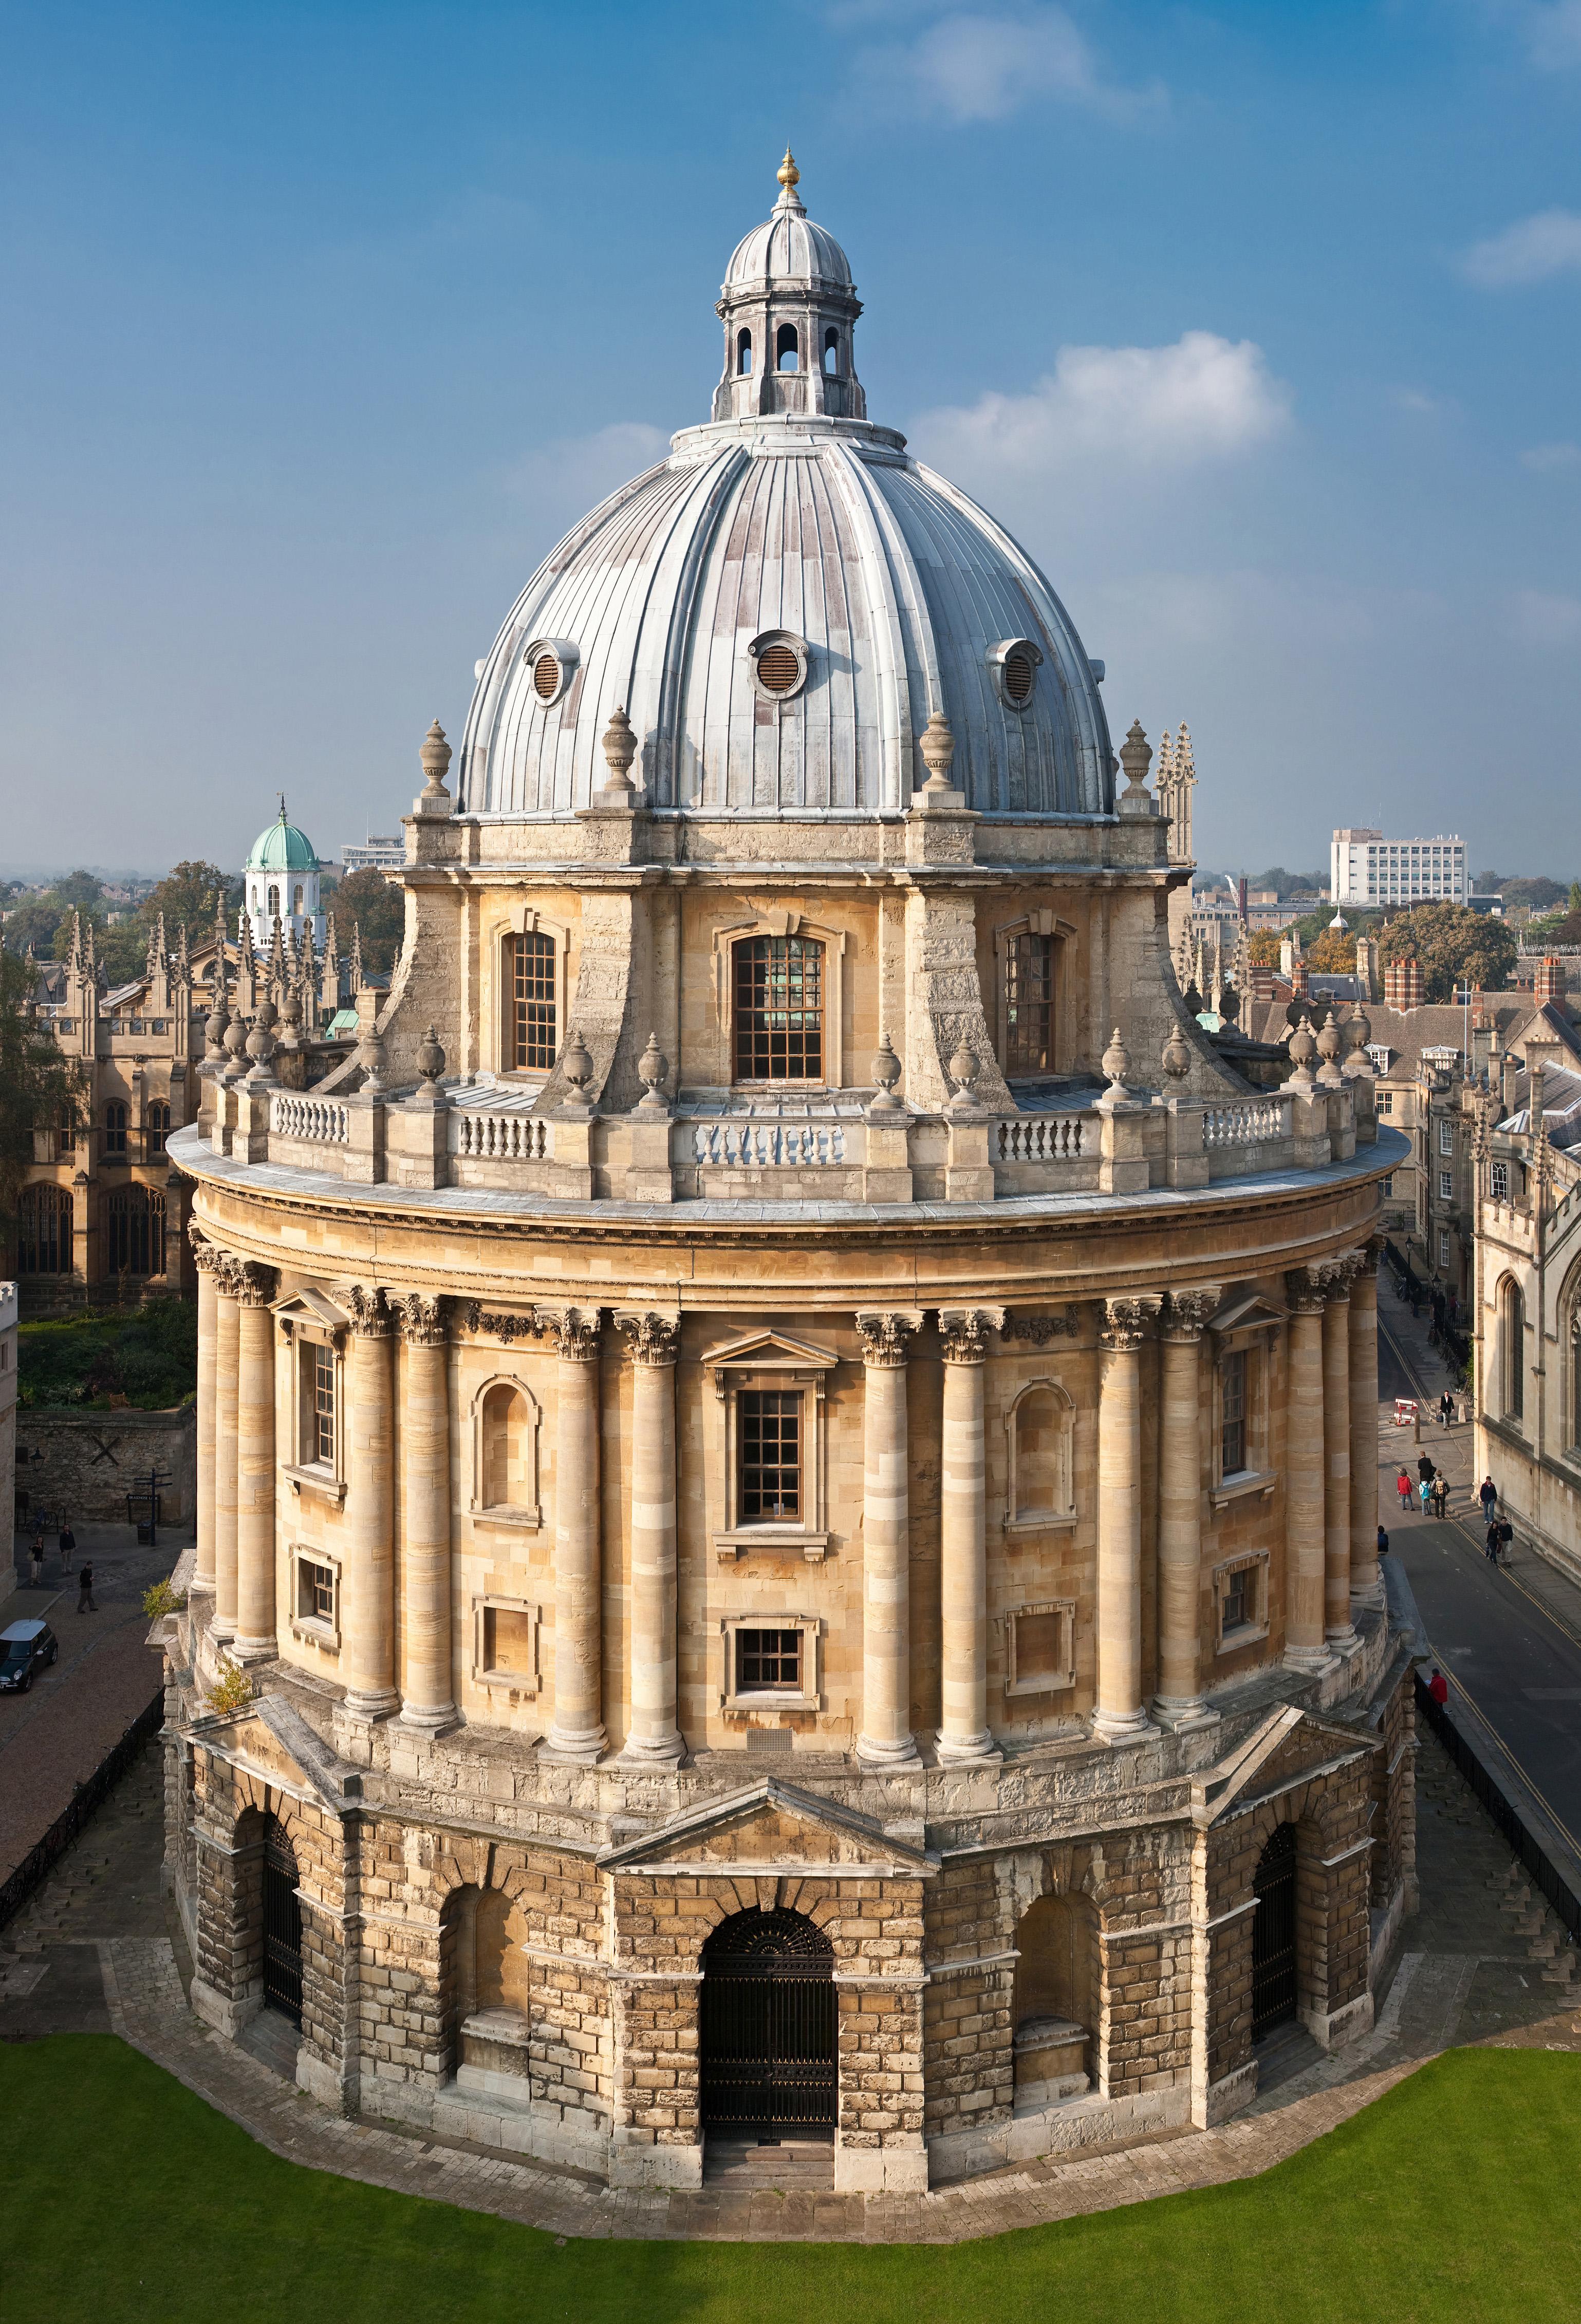 Oxford falls in global reputation rankings